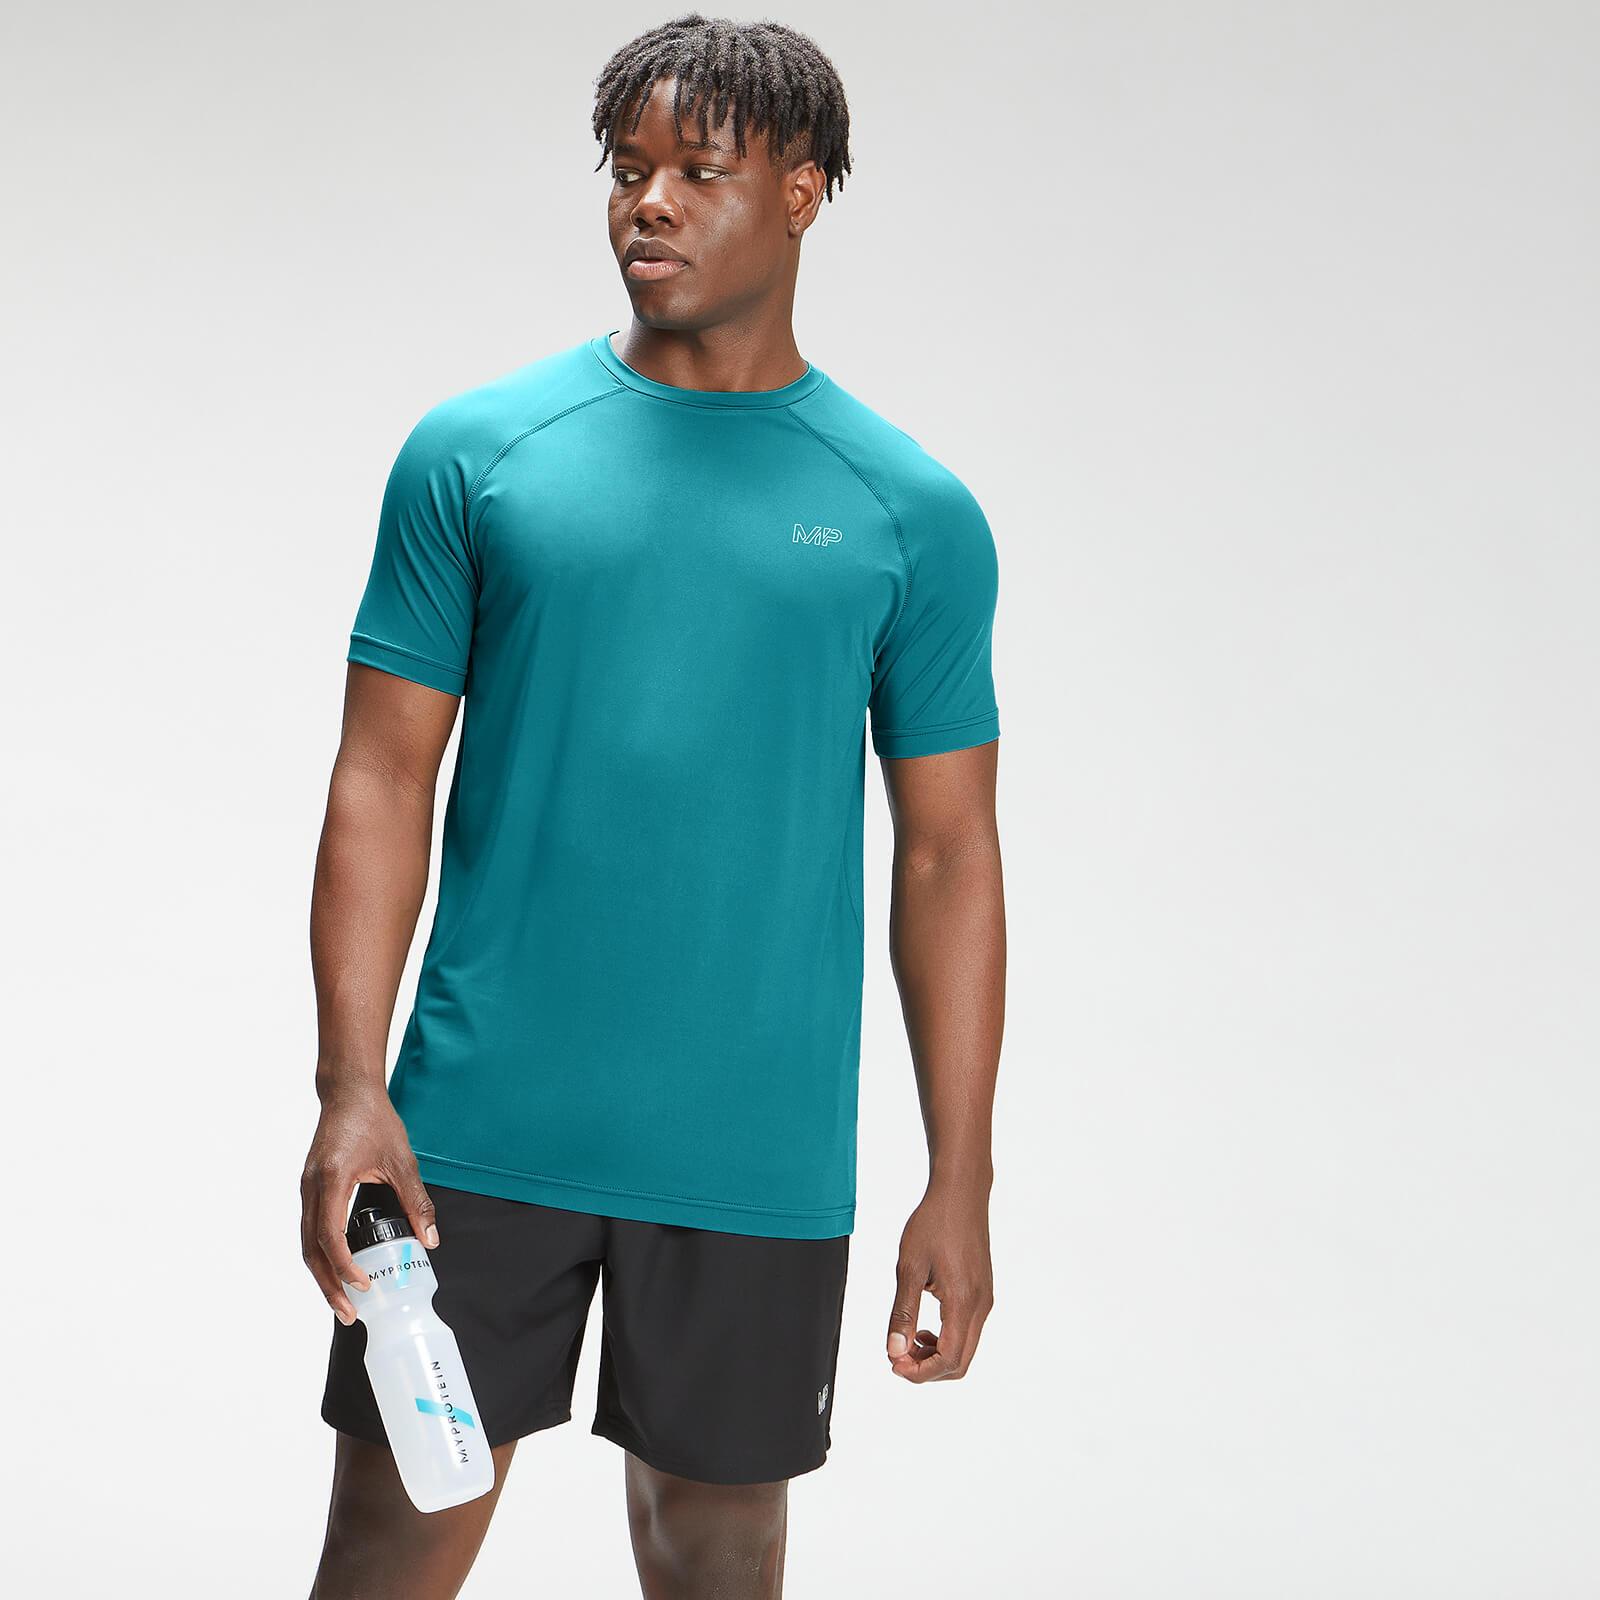 Купить MP Men's Repeat Mark Graphic Training Short Sleeve T-Shirt - Teal - XL, Myprotein International